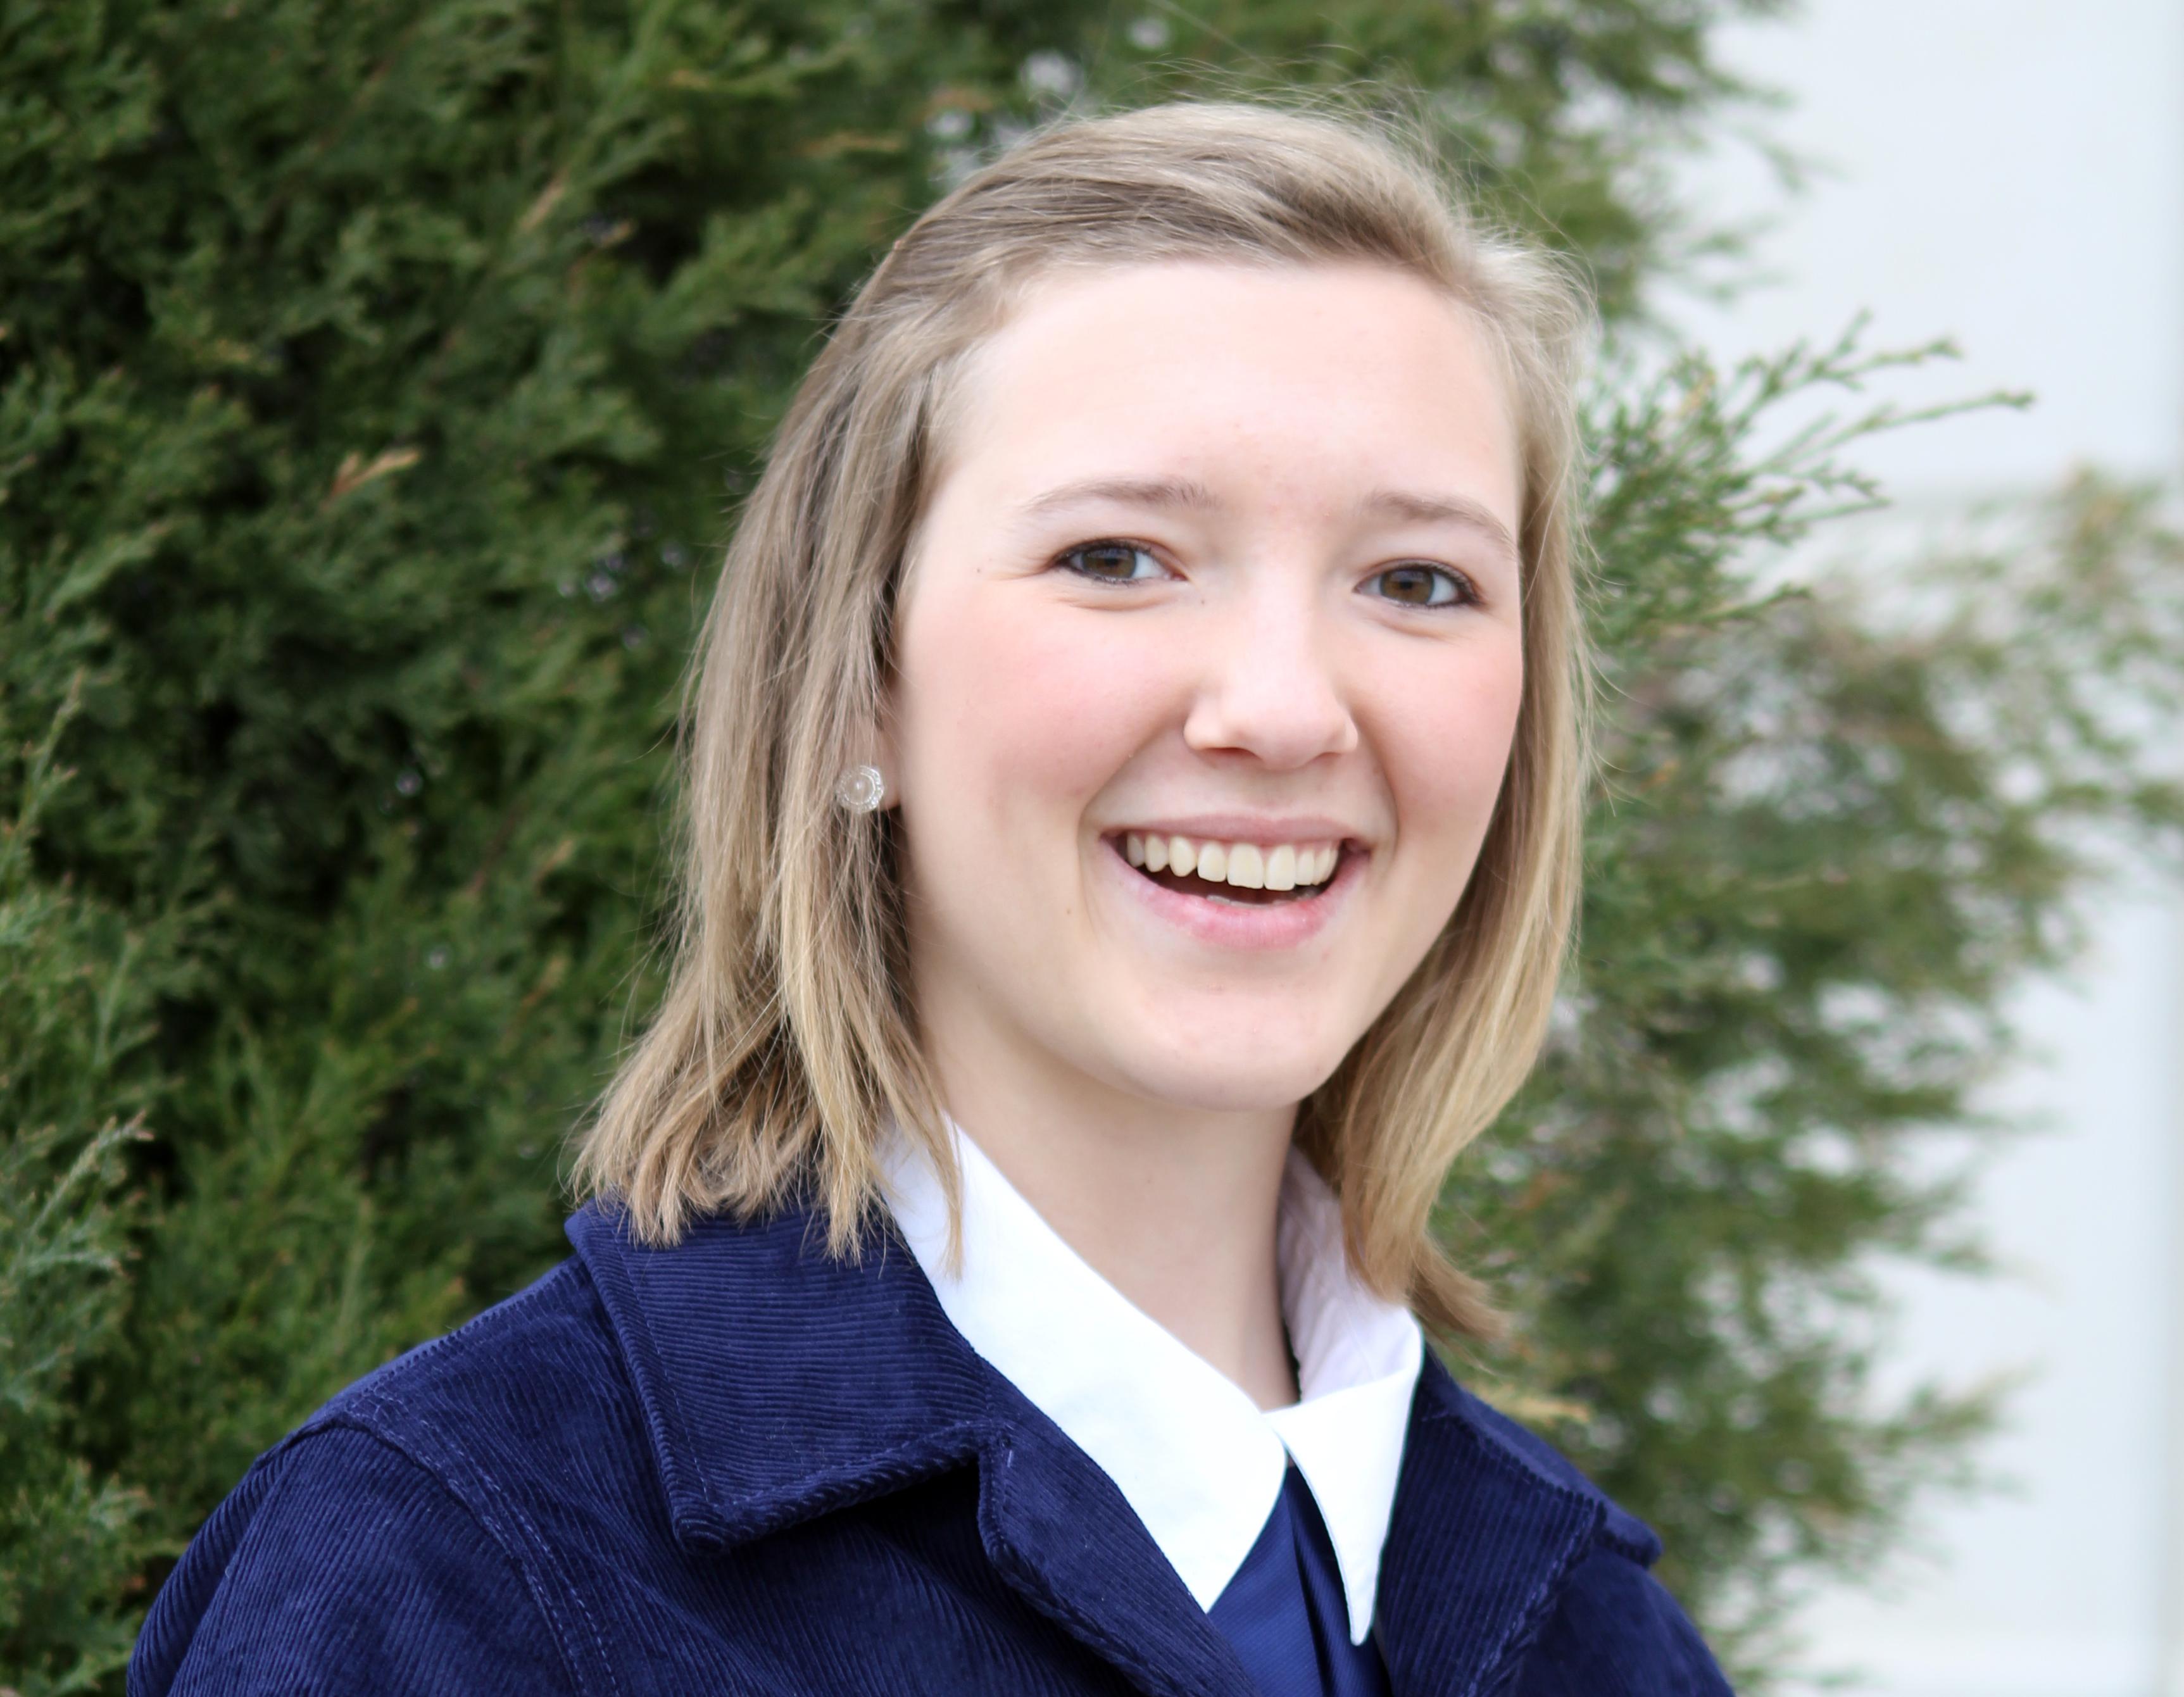 Meet Your 2016-17 Nebraska State FFA Vice President: Christy Cooper